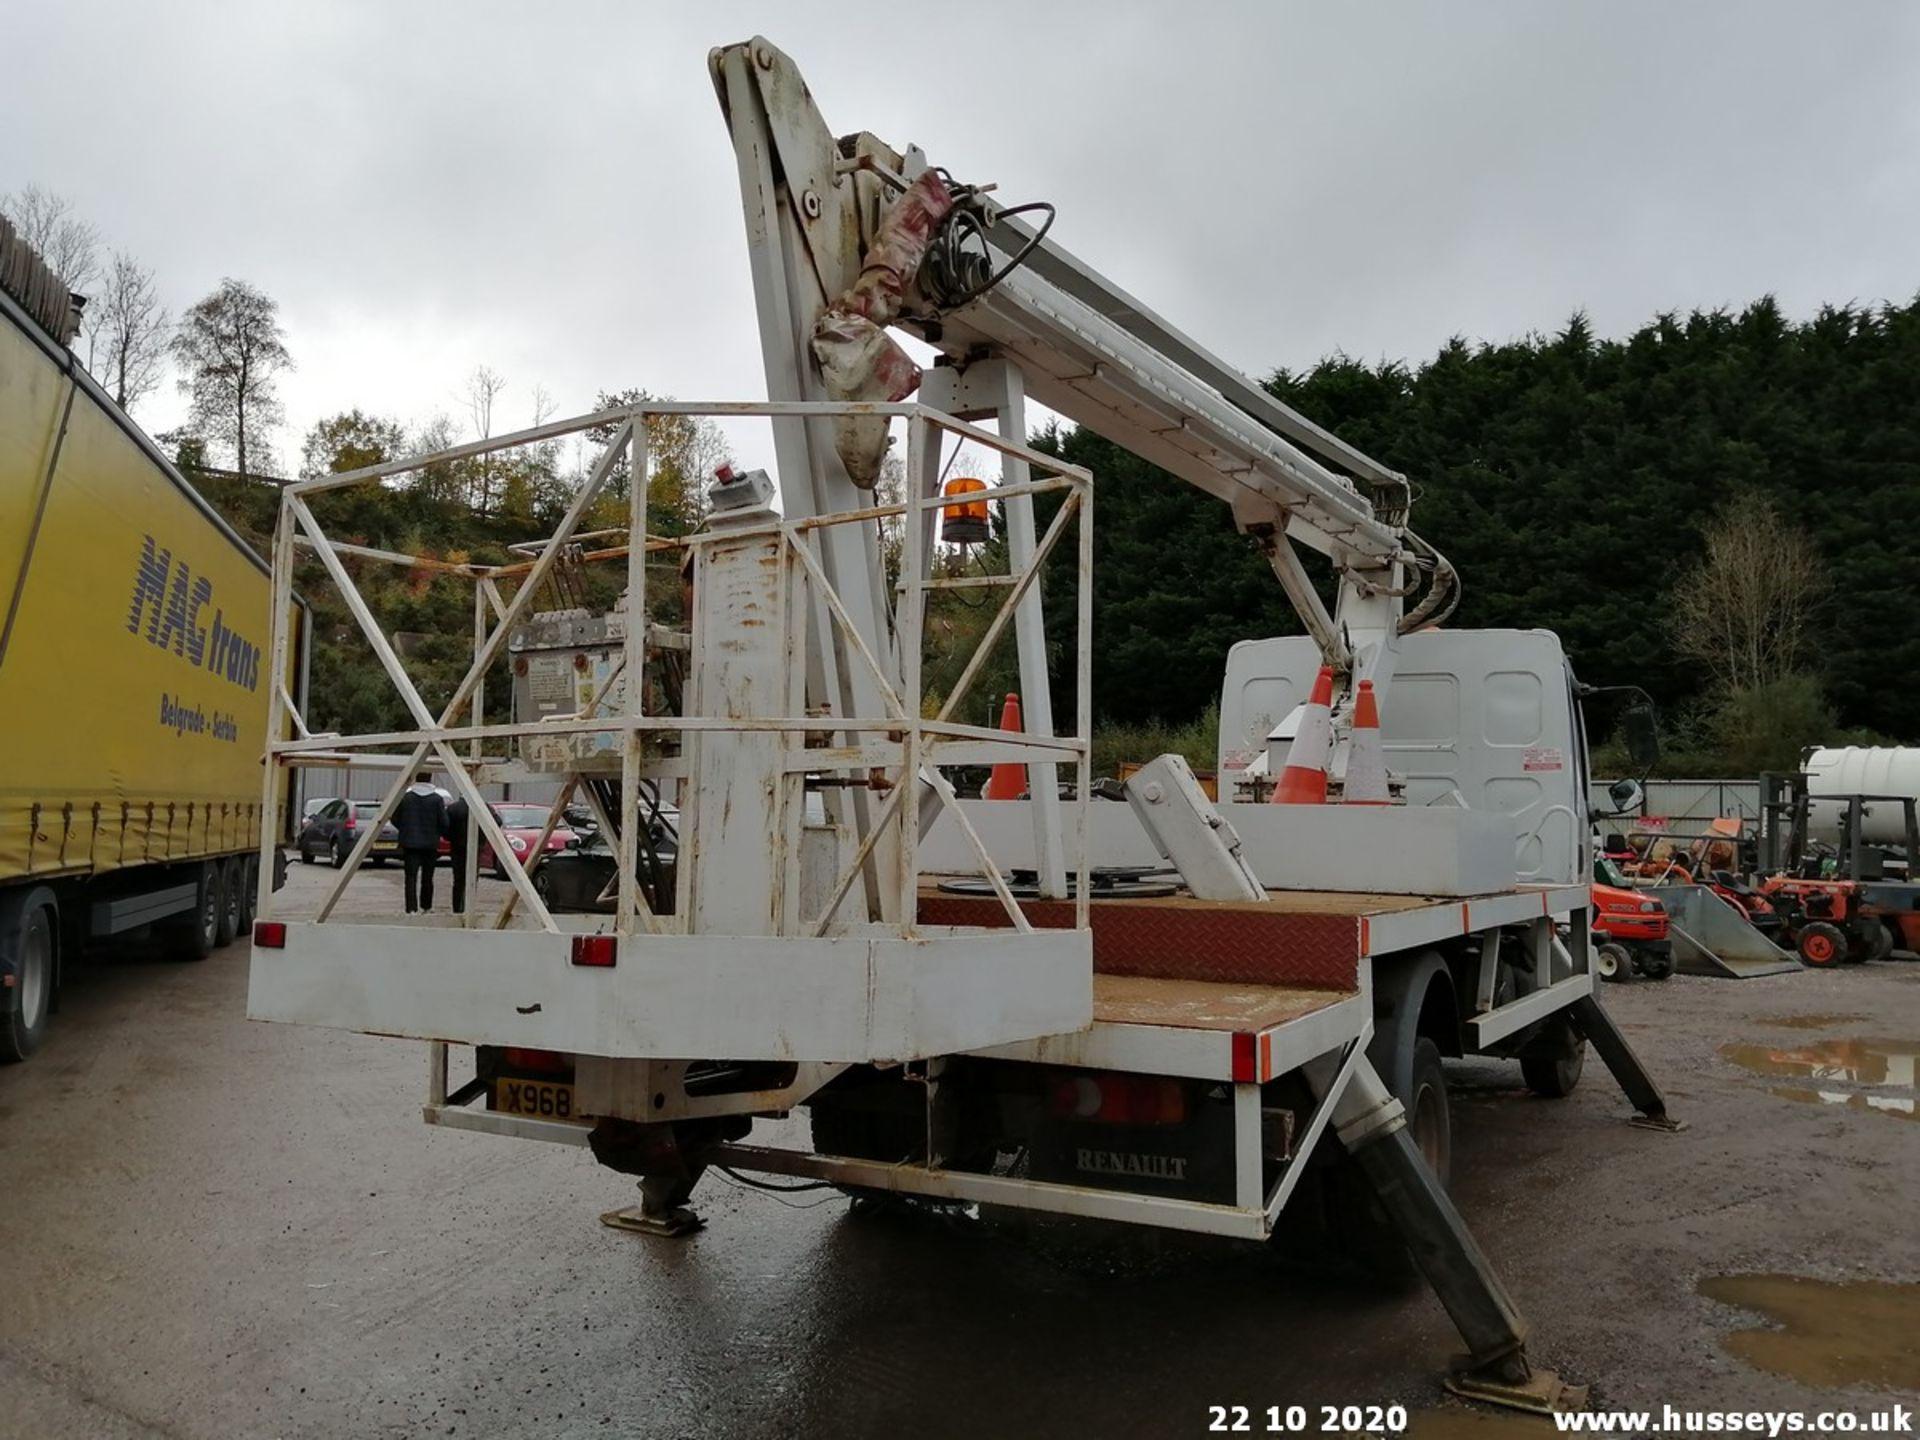 2001 RENAULT MIDLUM CHERRY PICKER- 4116cc 5dr (White, 362k) - Image 6 of 7